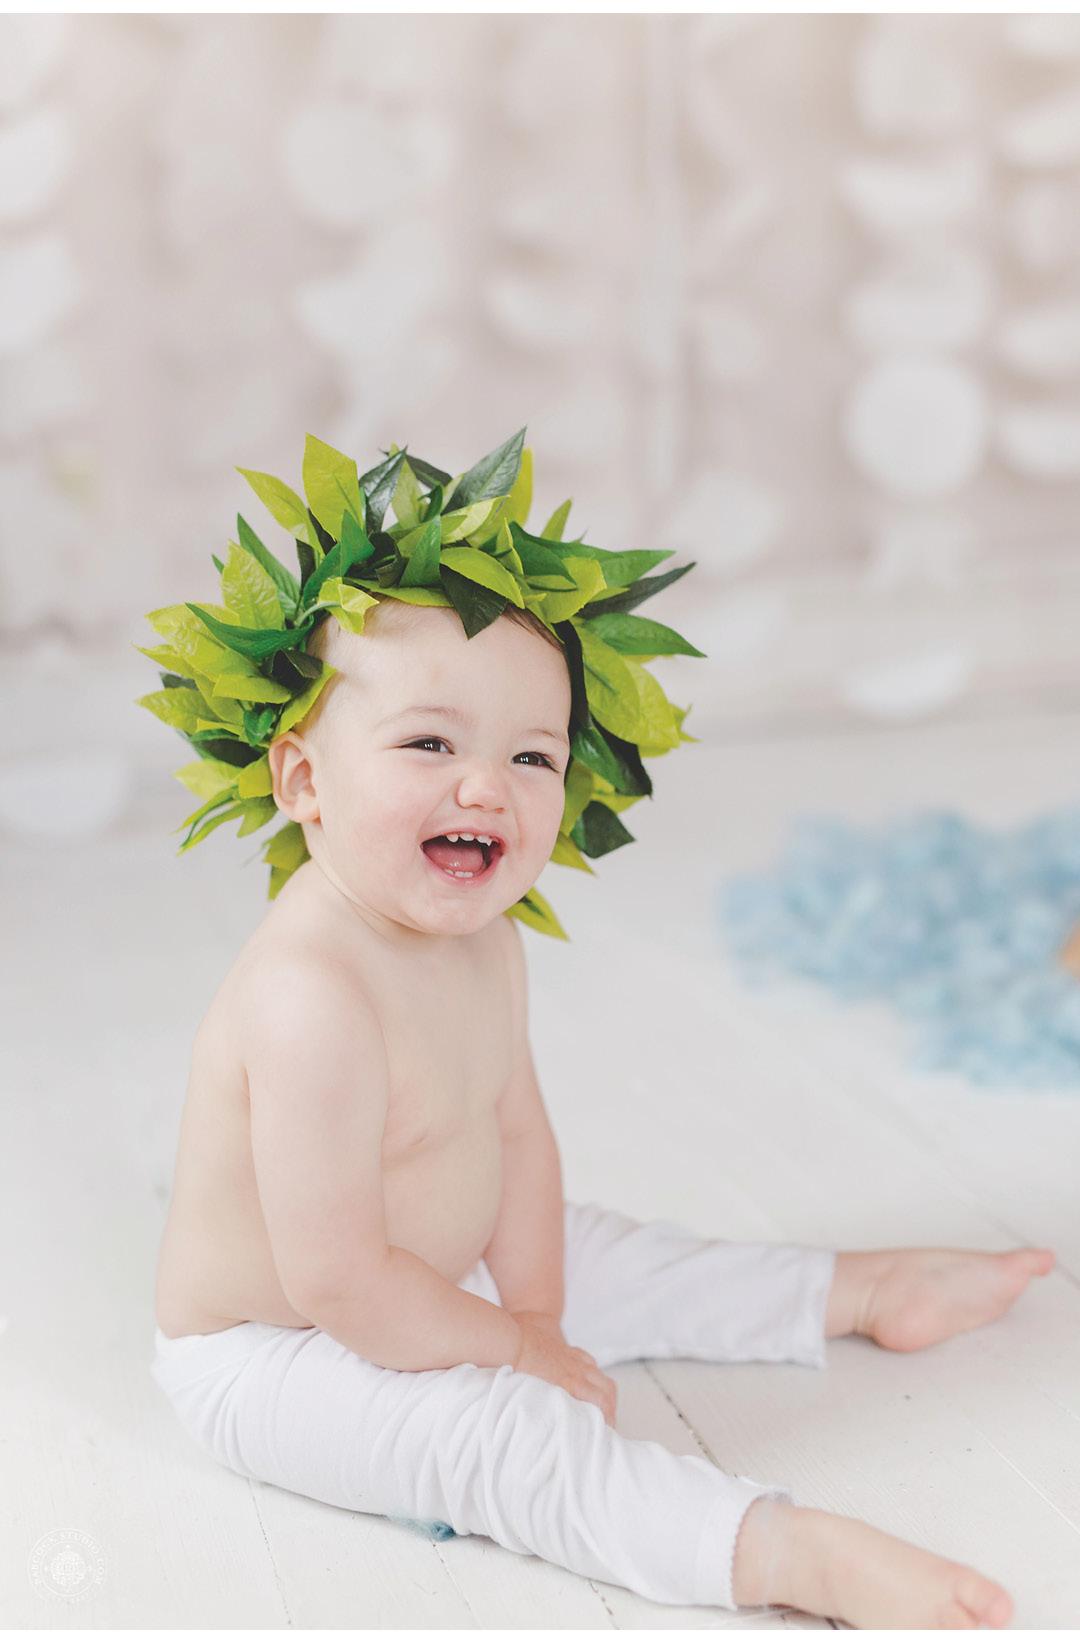 laena-vail-children-portraits-photographer-dayton-ohio-.jpg